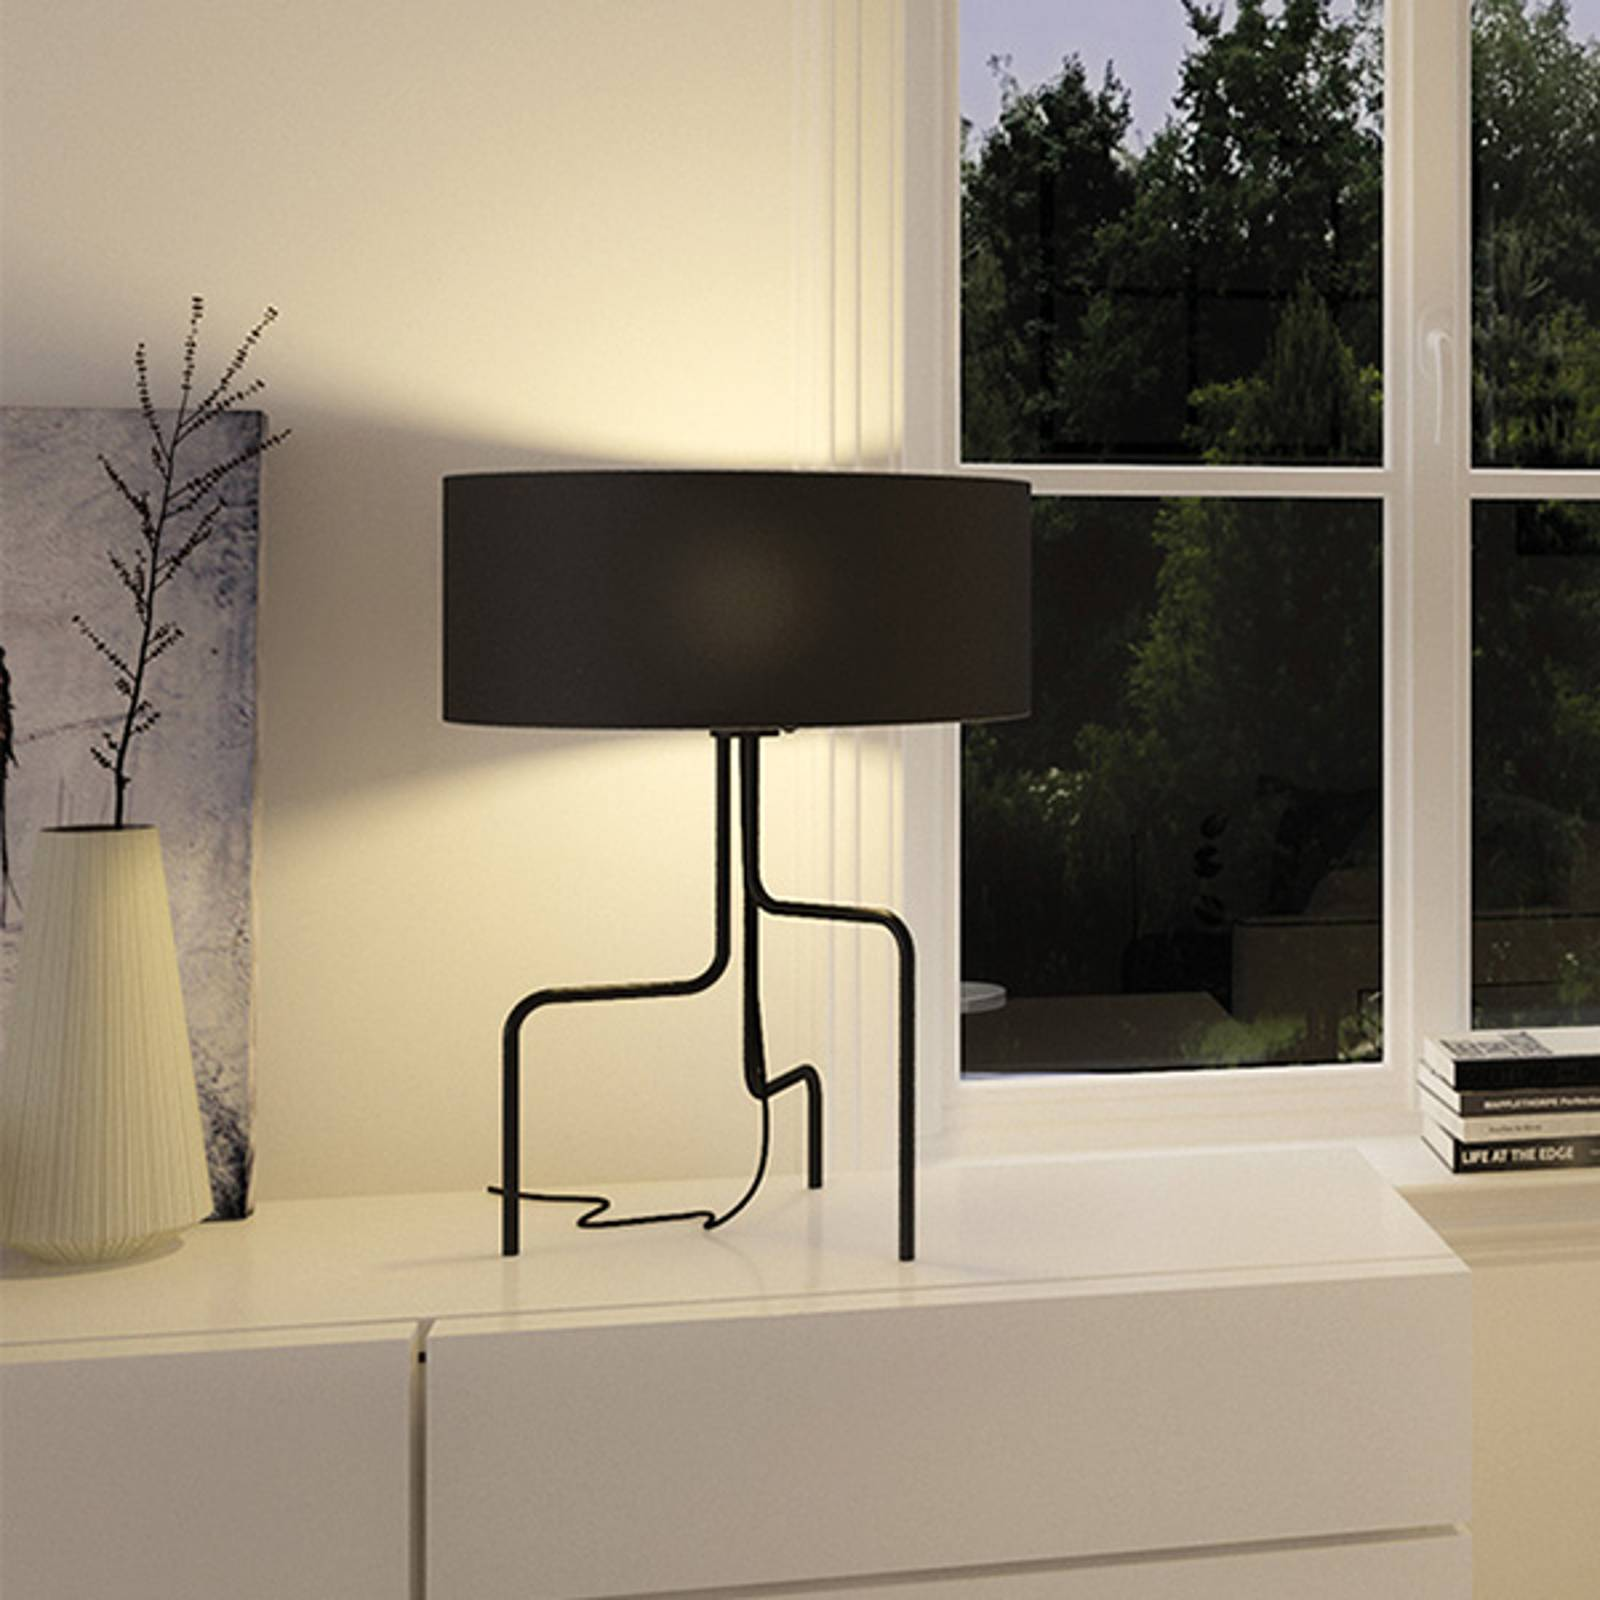 Textil-bordslampa Borneo, svart, tre ben